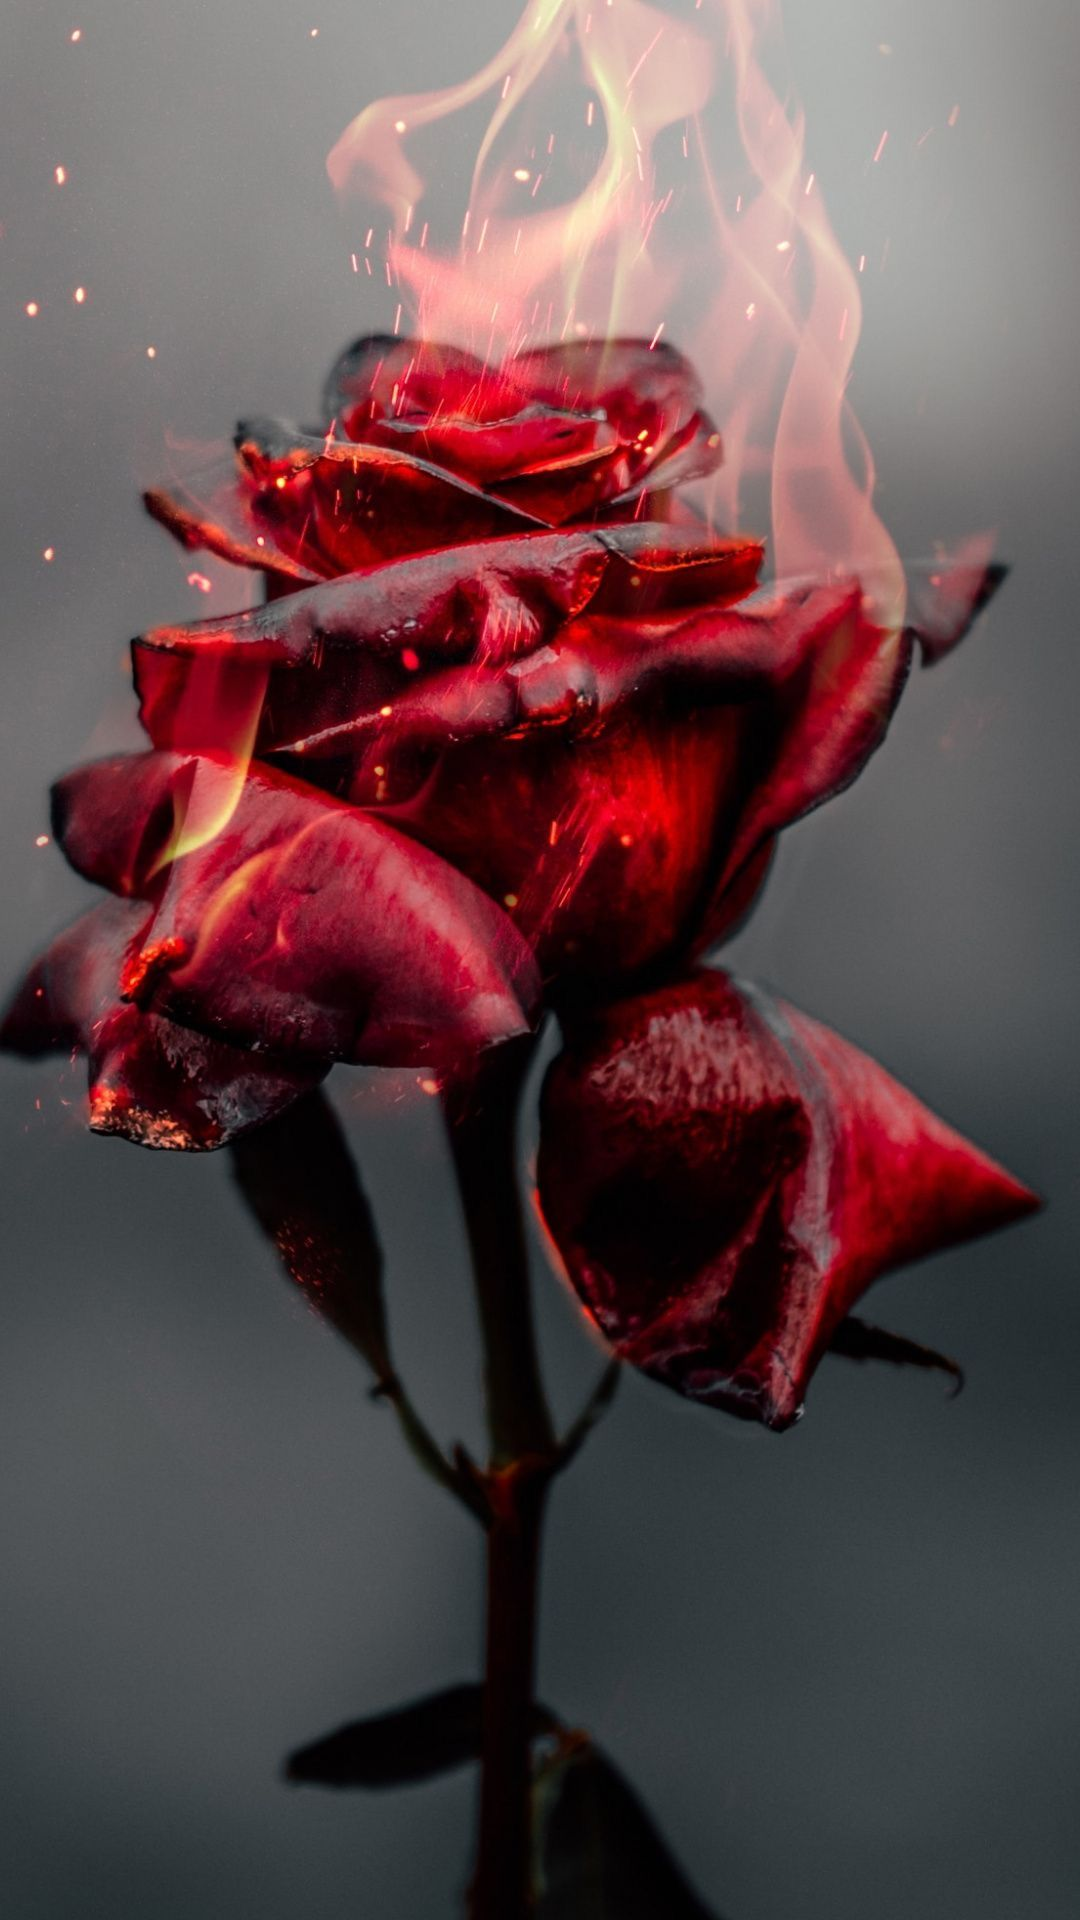 Love Destroyed Red Flower Wallpaper Red Roses Wallpaper Rose Wallpaper